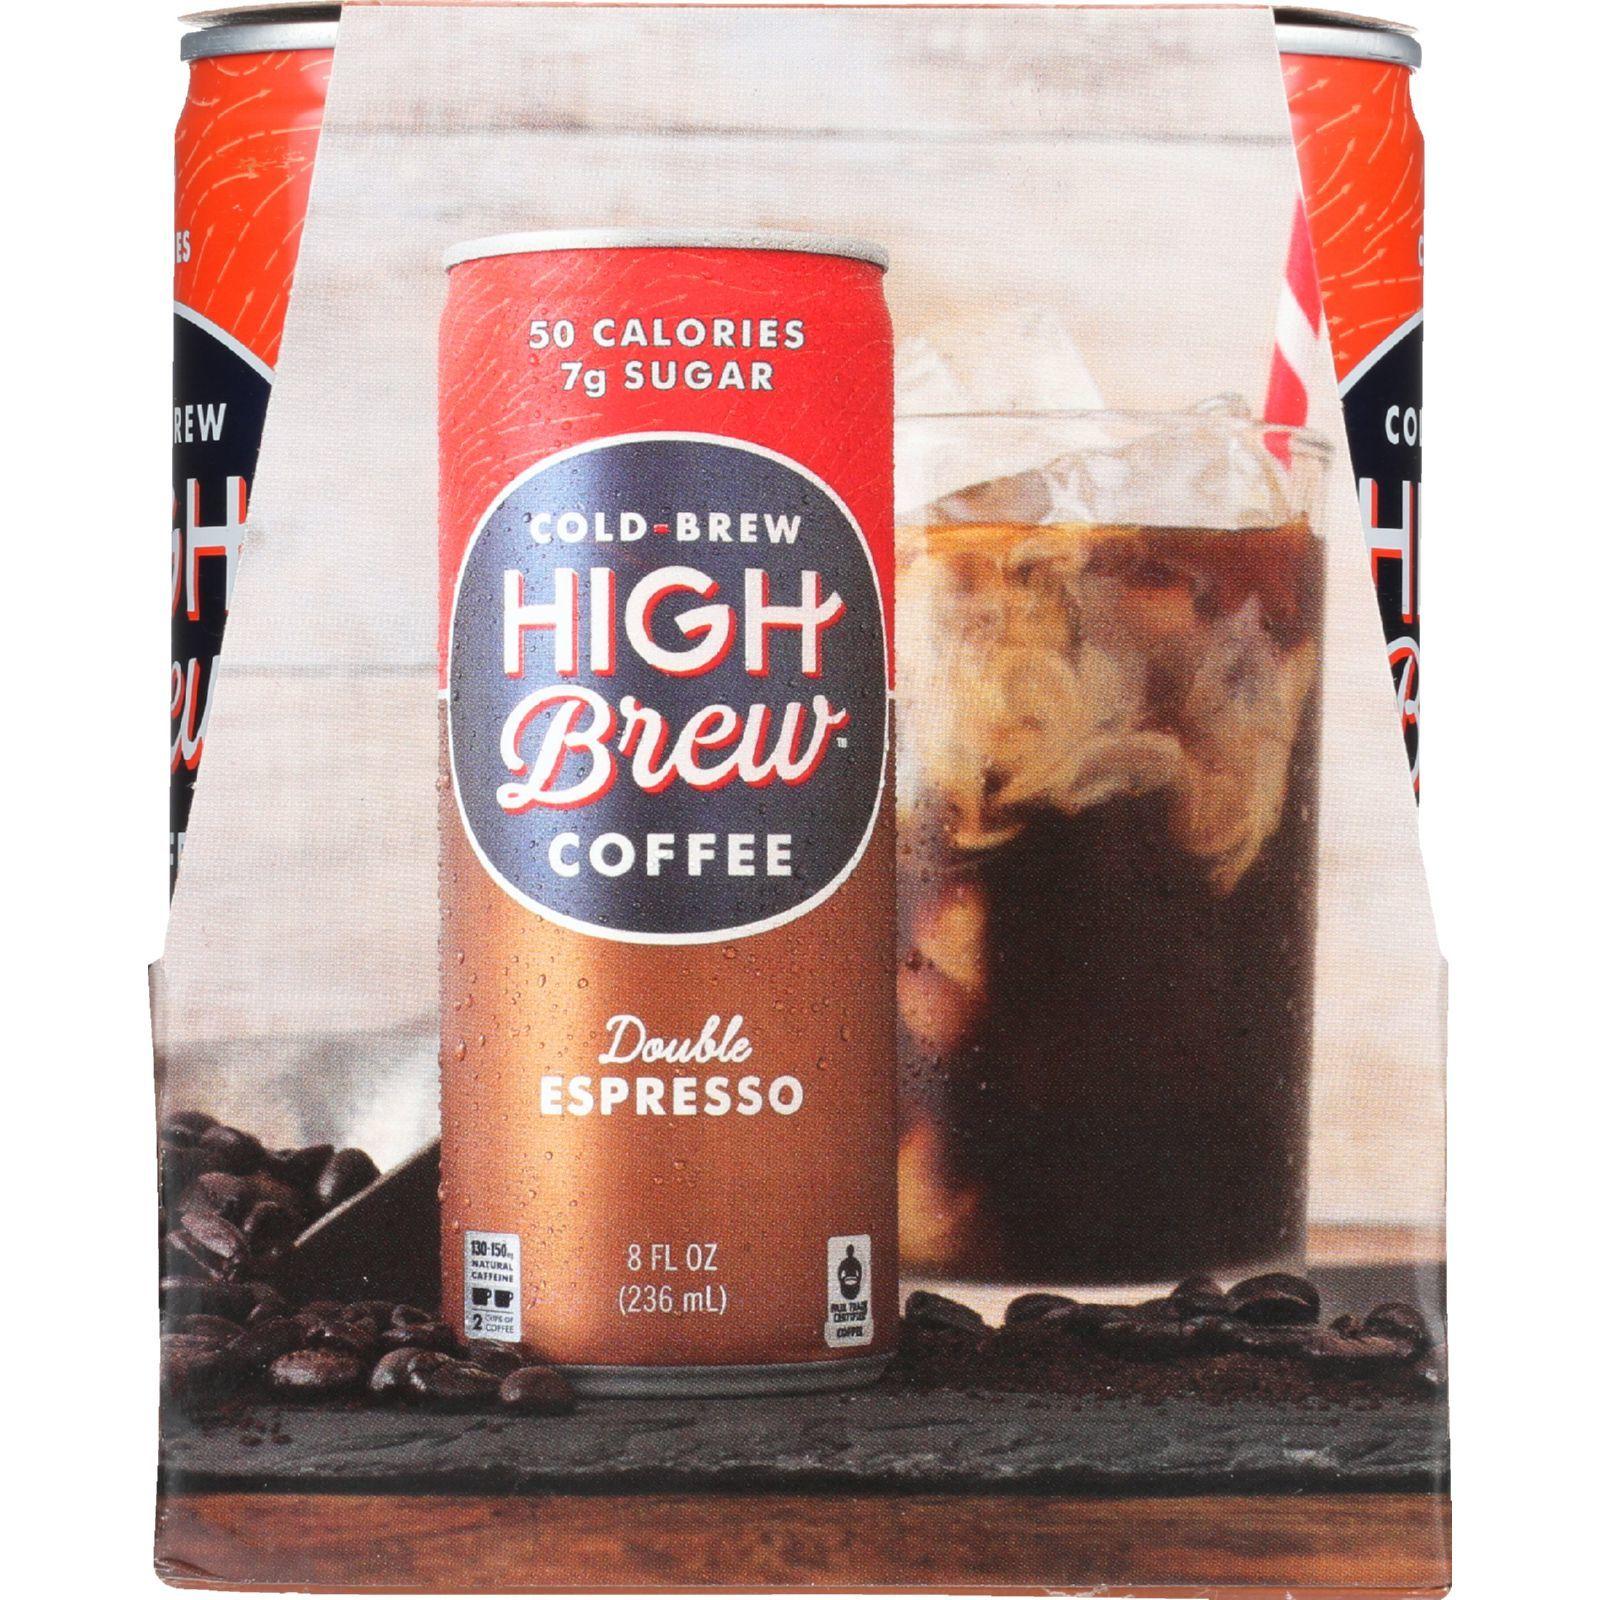 High Brew Coffee Coffee - Ready to Drink - Double Espresso - 4/8 oz - case of 6